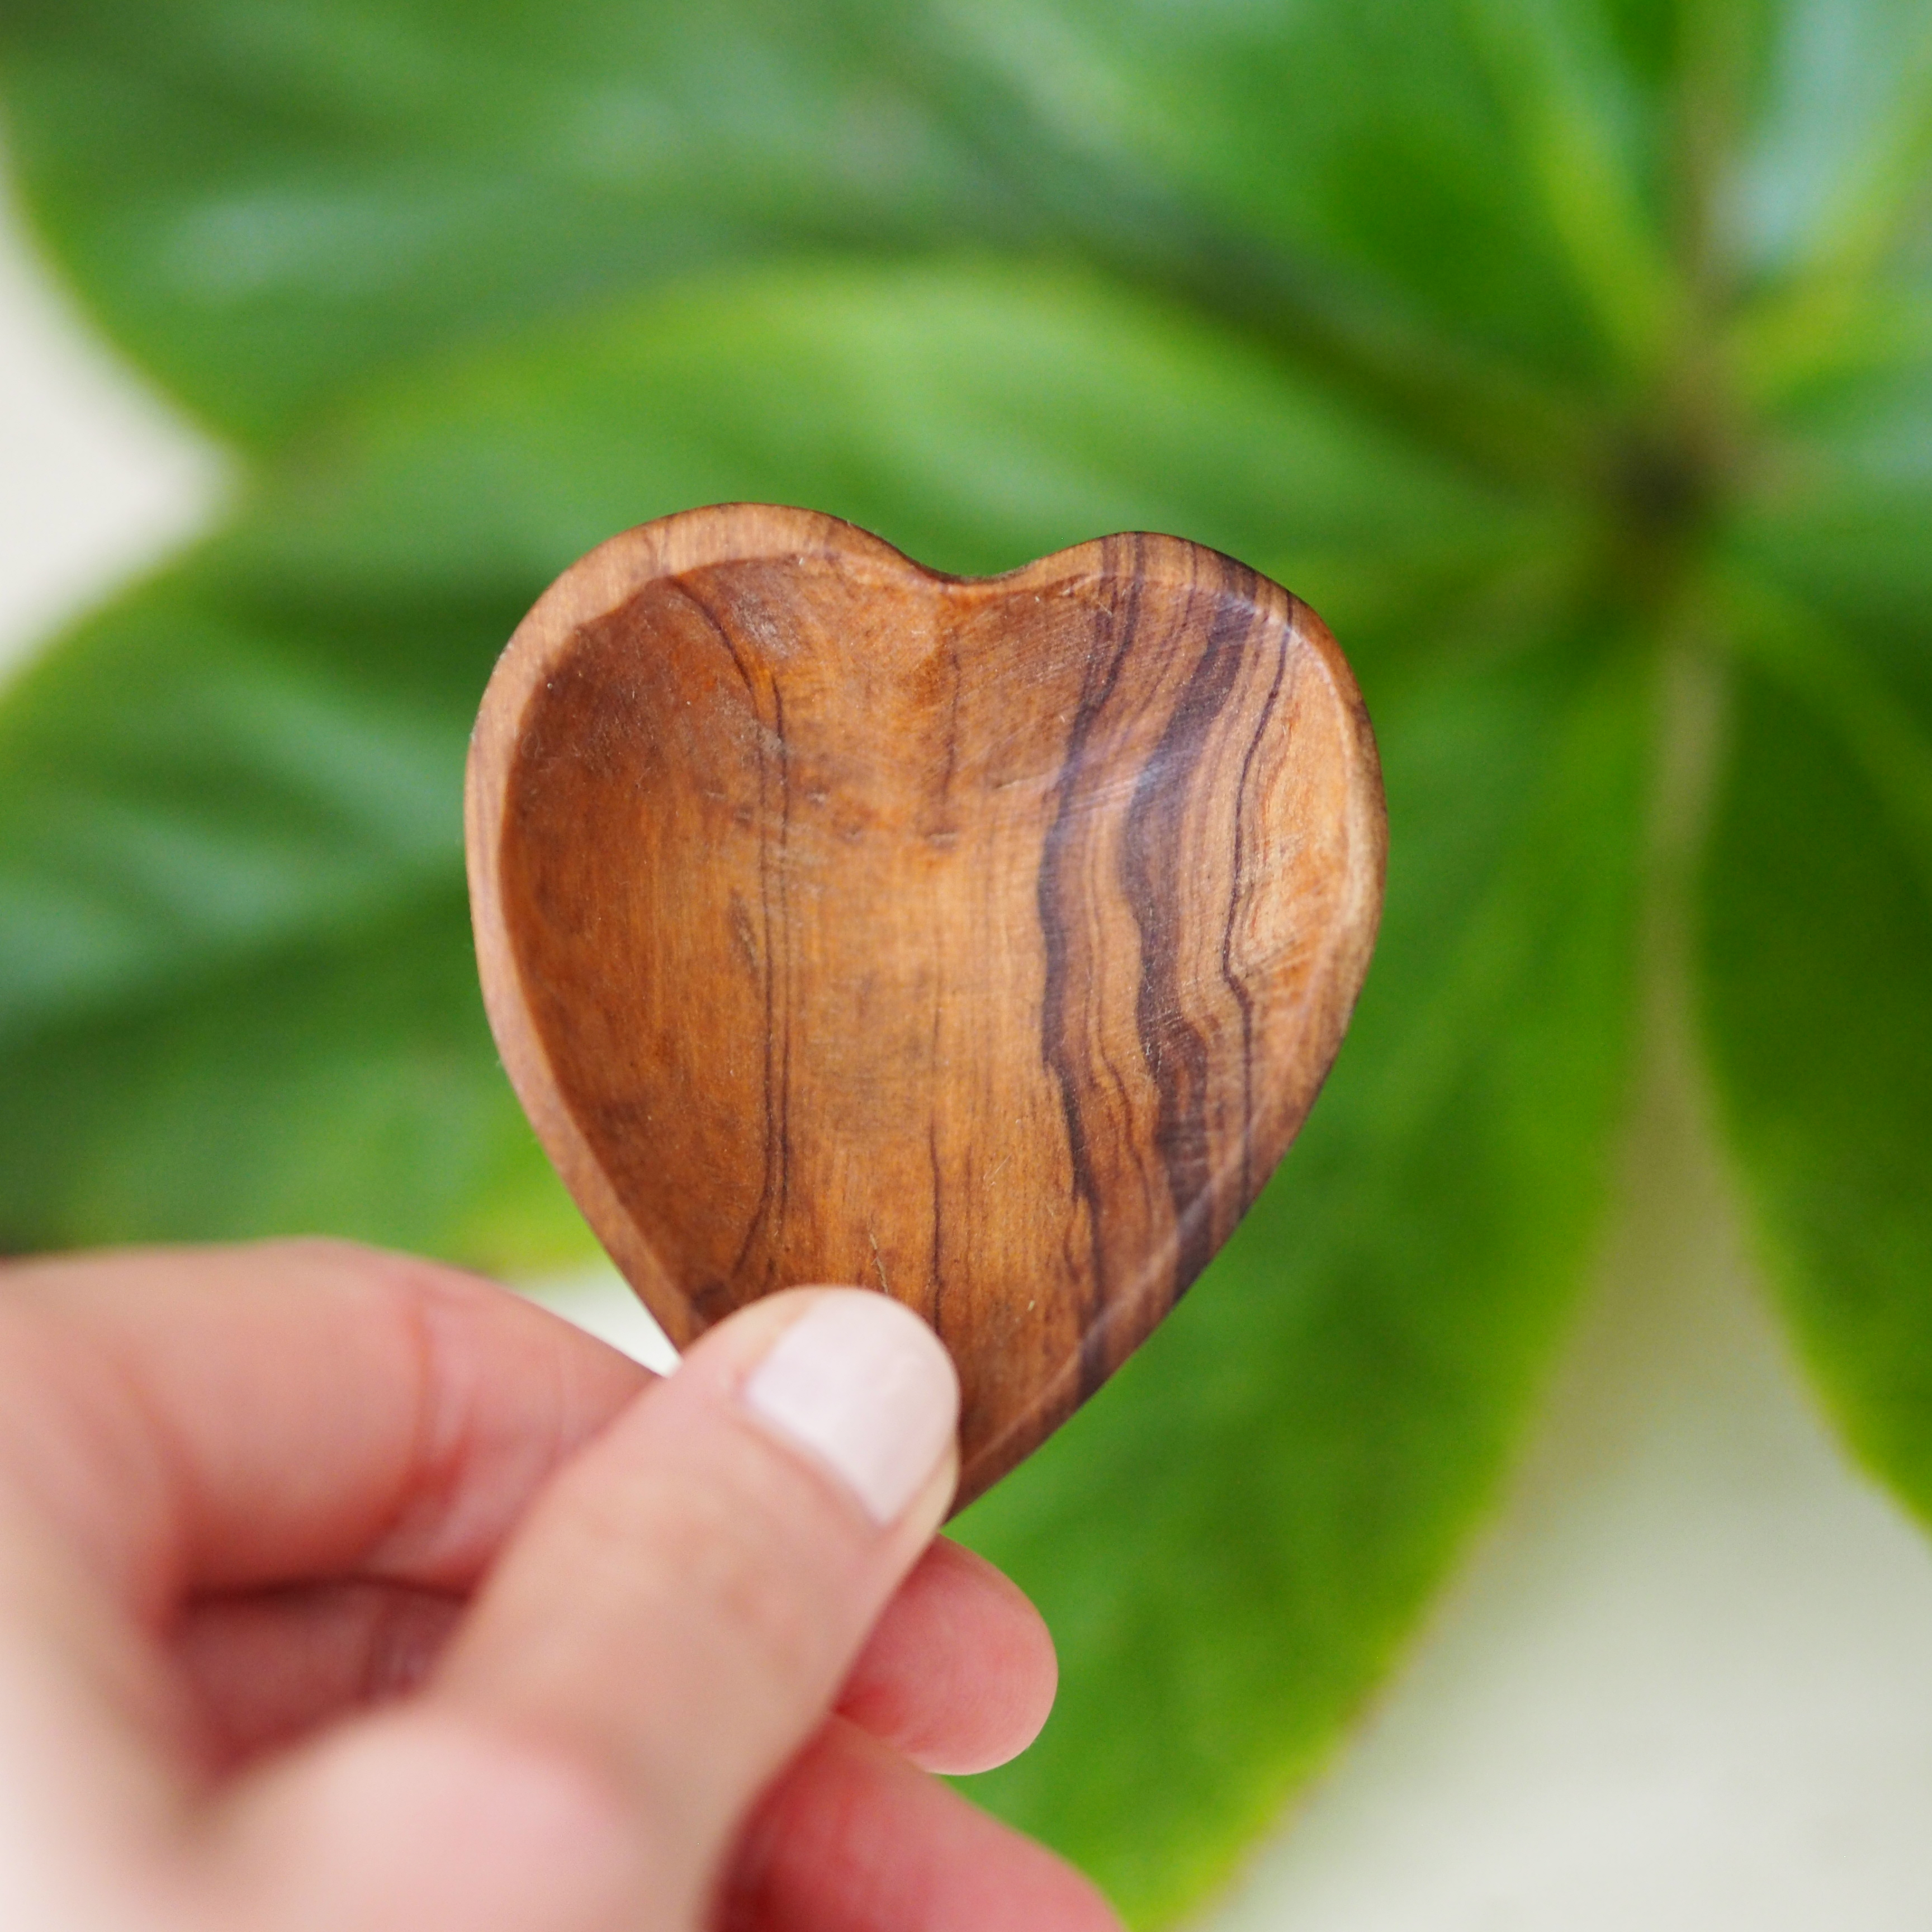 Little wooden heart against green.JPG